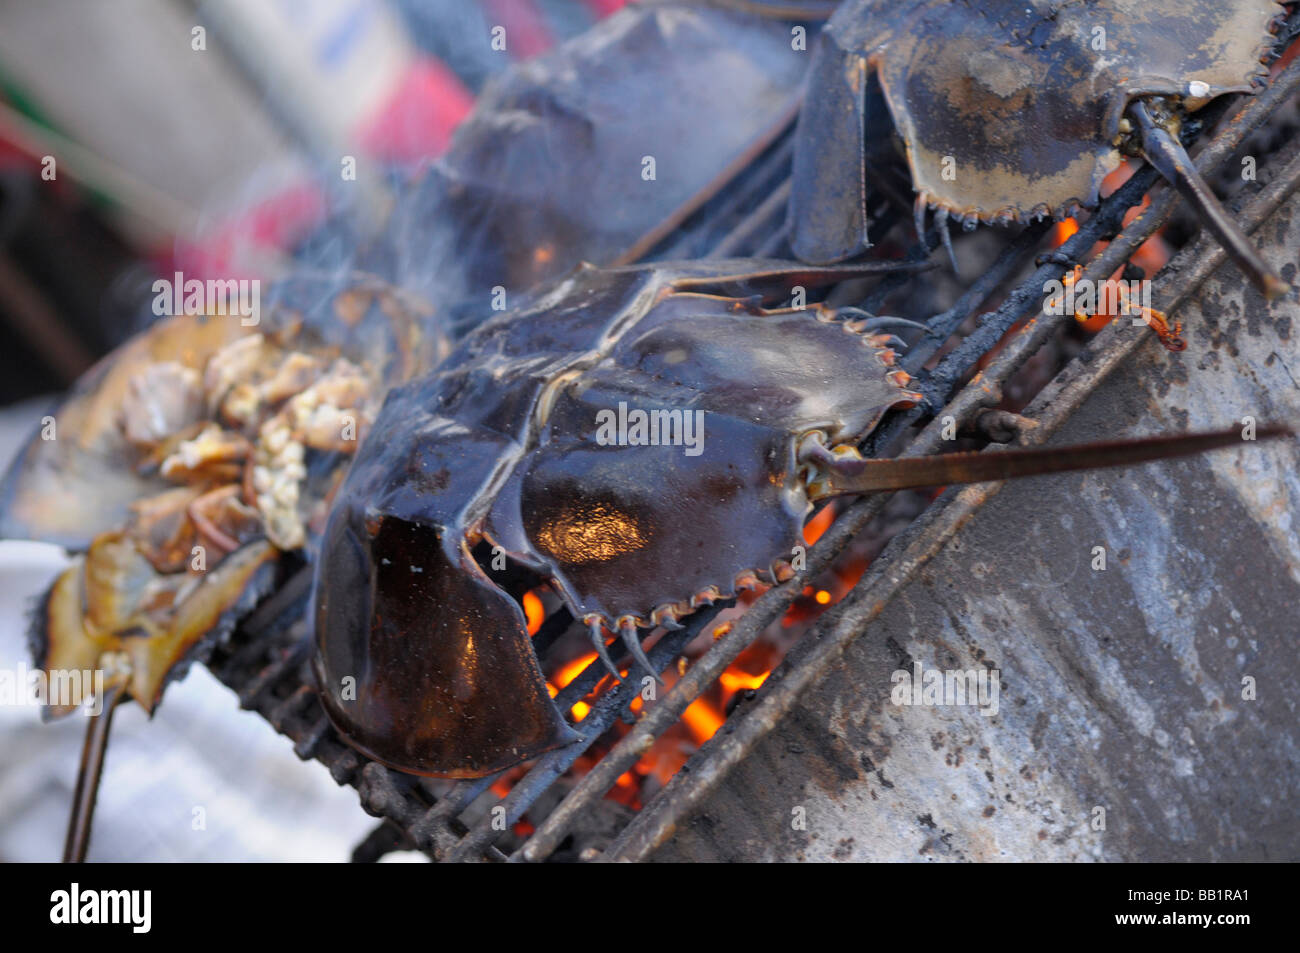 bbq king crab Stock Photo - Alamy